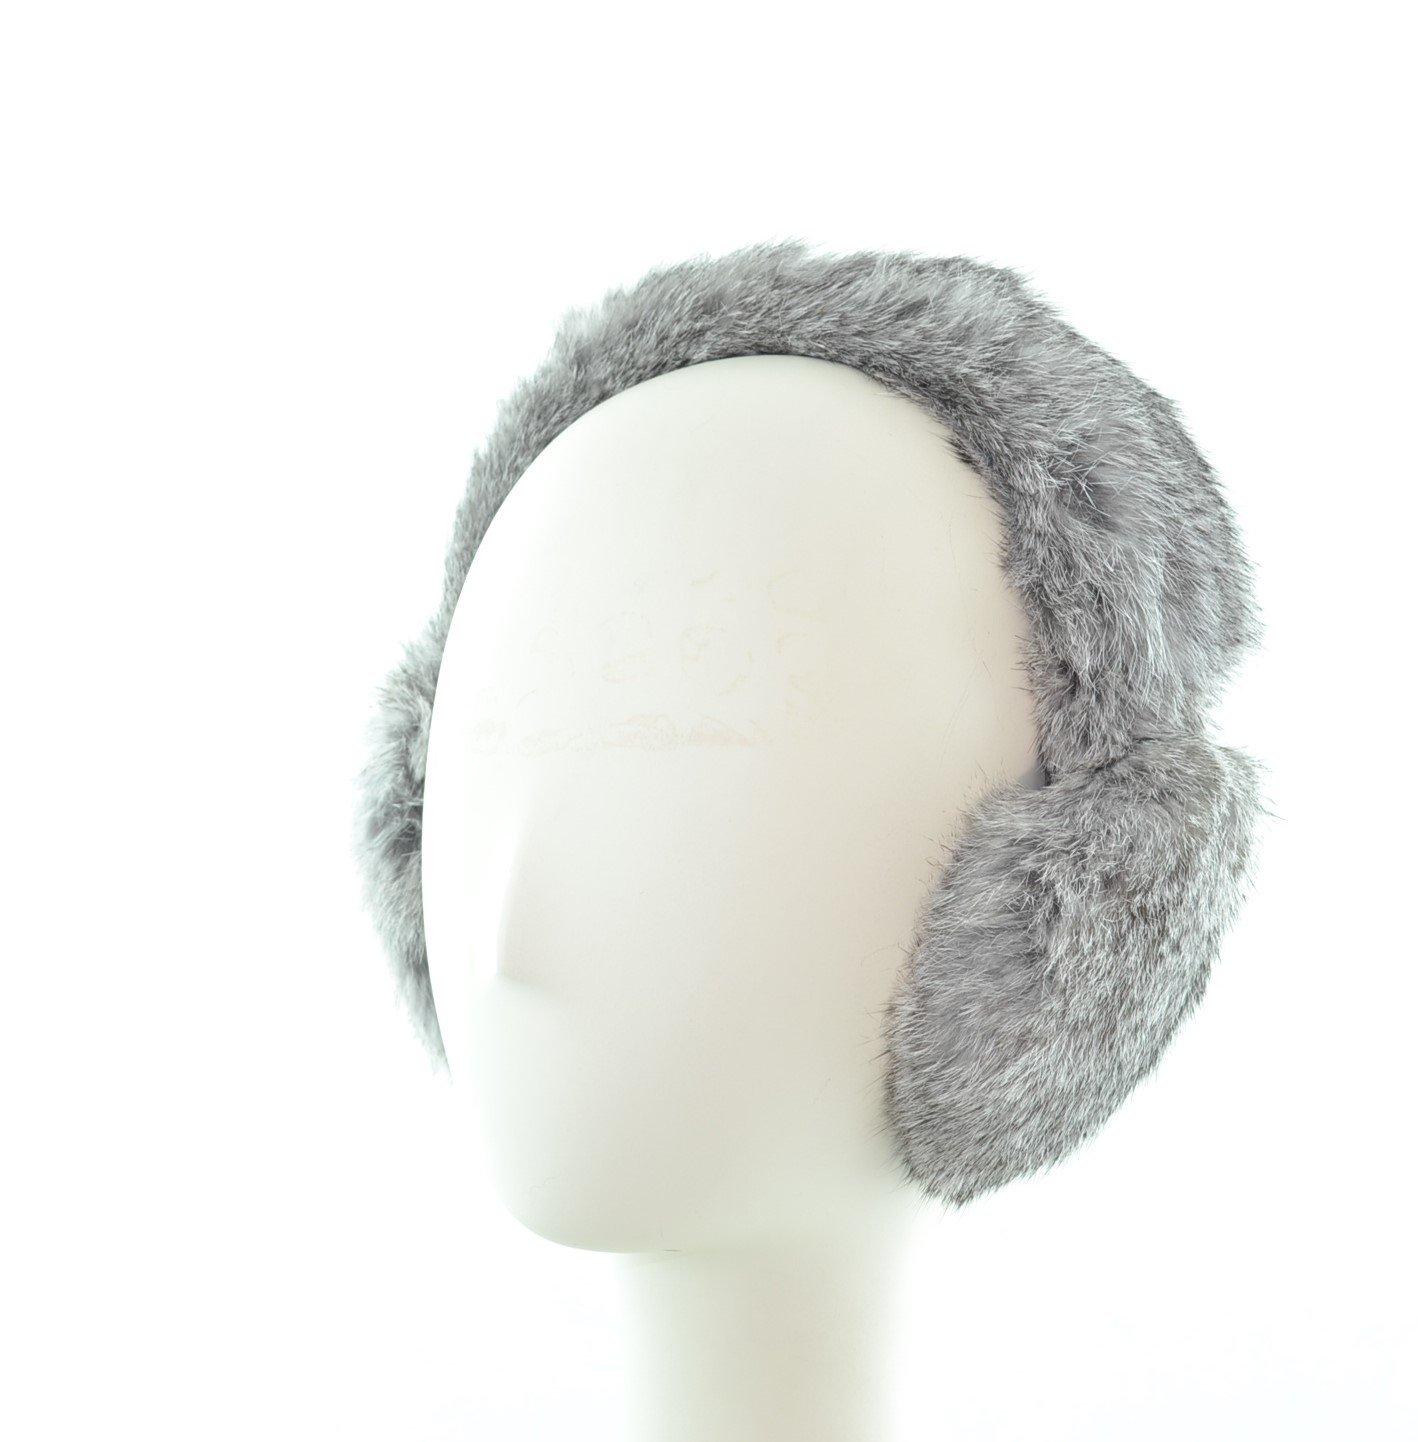 Surell Genuine Grey Rabbit Fur Earmuffs with Soft All Fur Non Adjustable All Fur Head Band, Winter Fashion Ear Warmers, Perfect Elegant Women's Luxury Gift